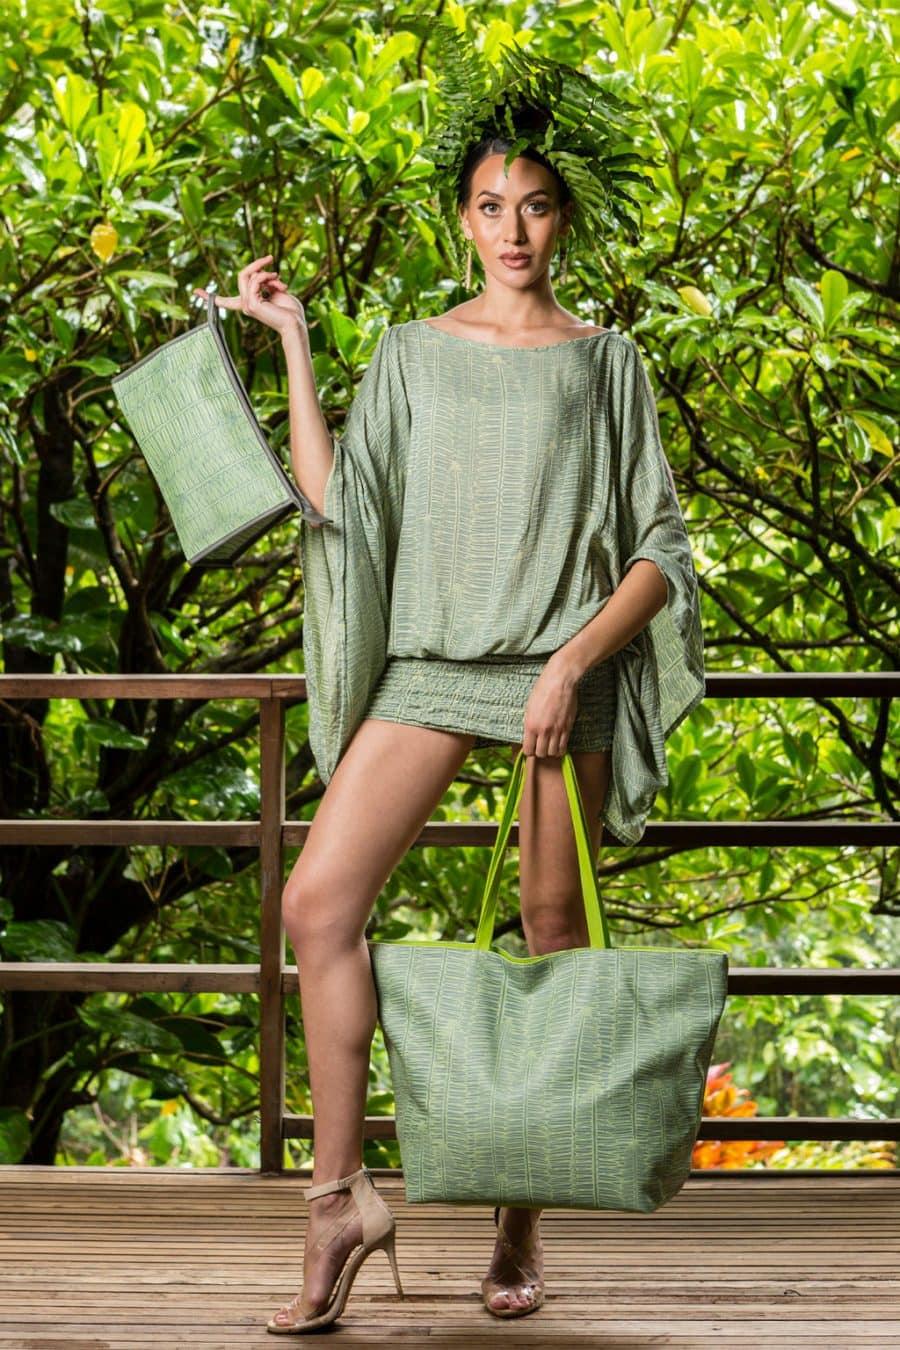 Model Holding Wailani Tote in Lily Pad Margarita Kupukupu pattern